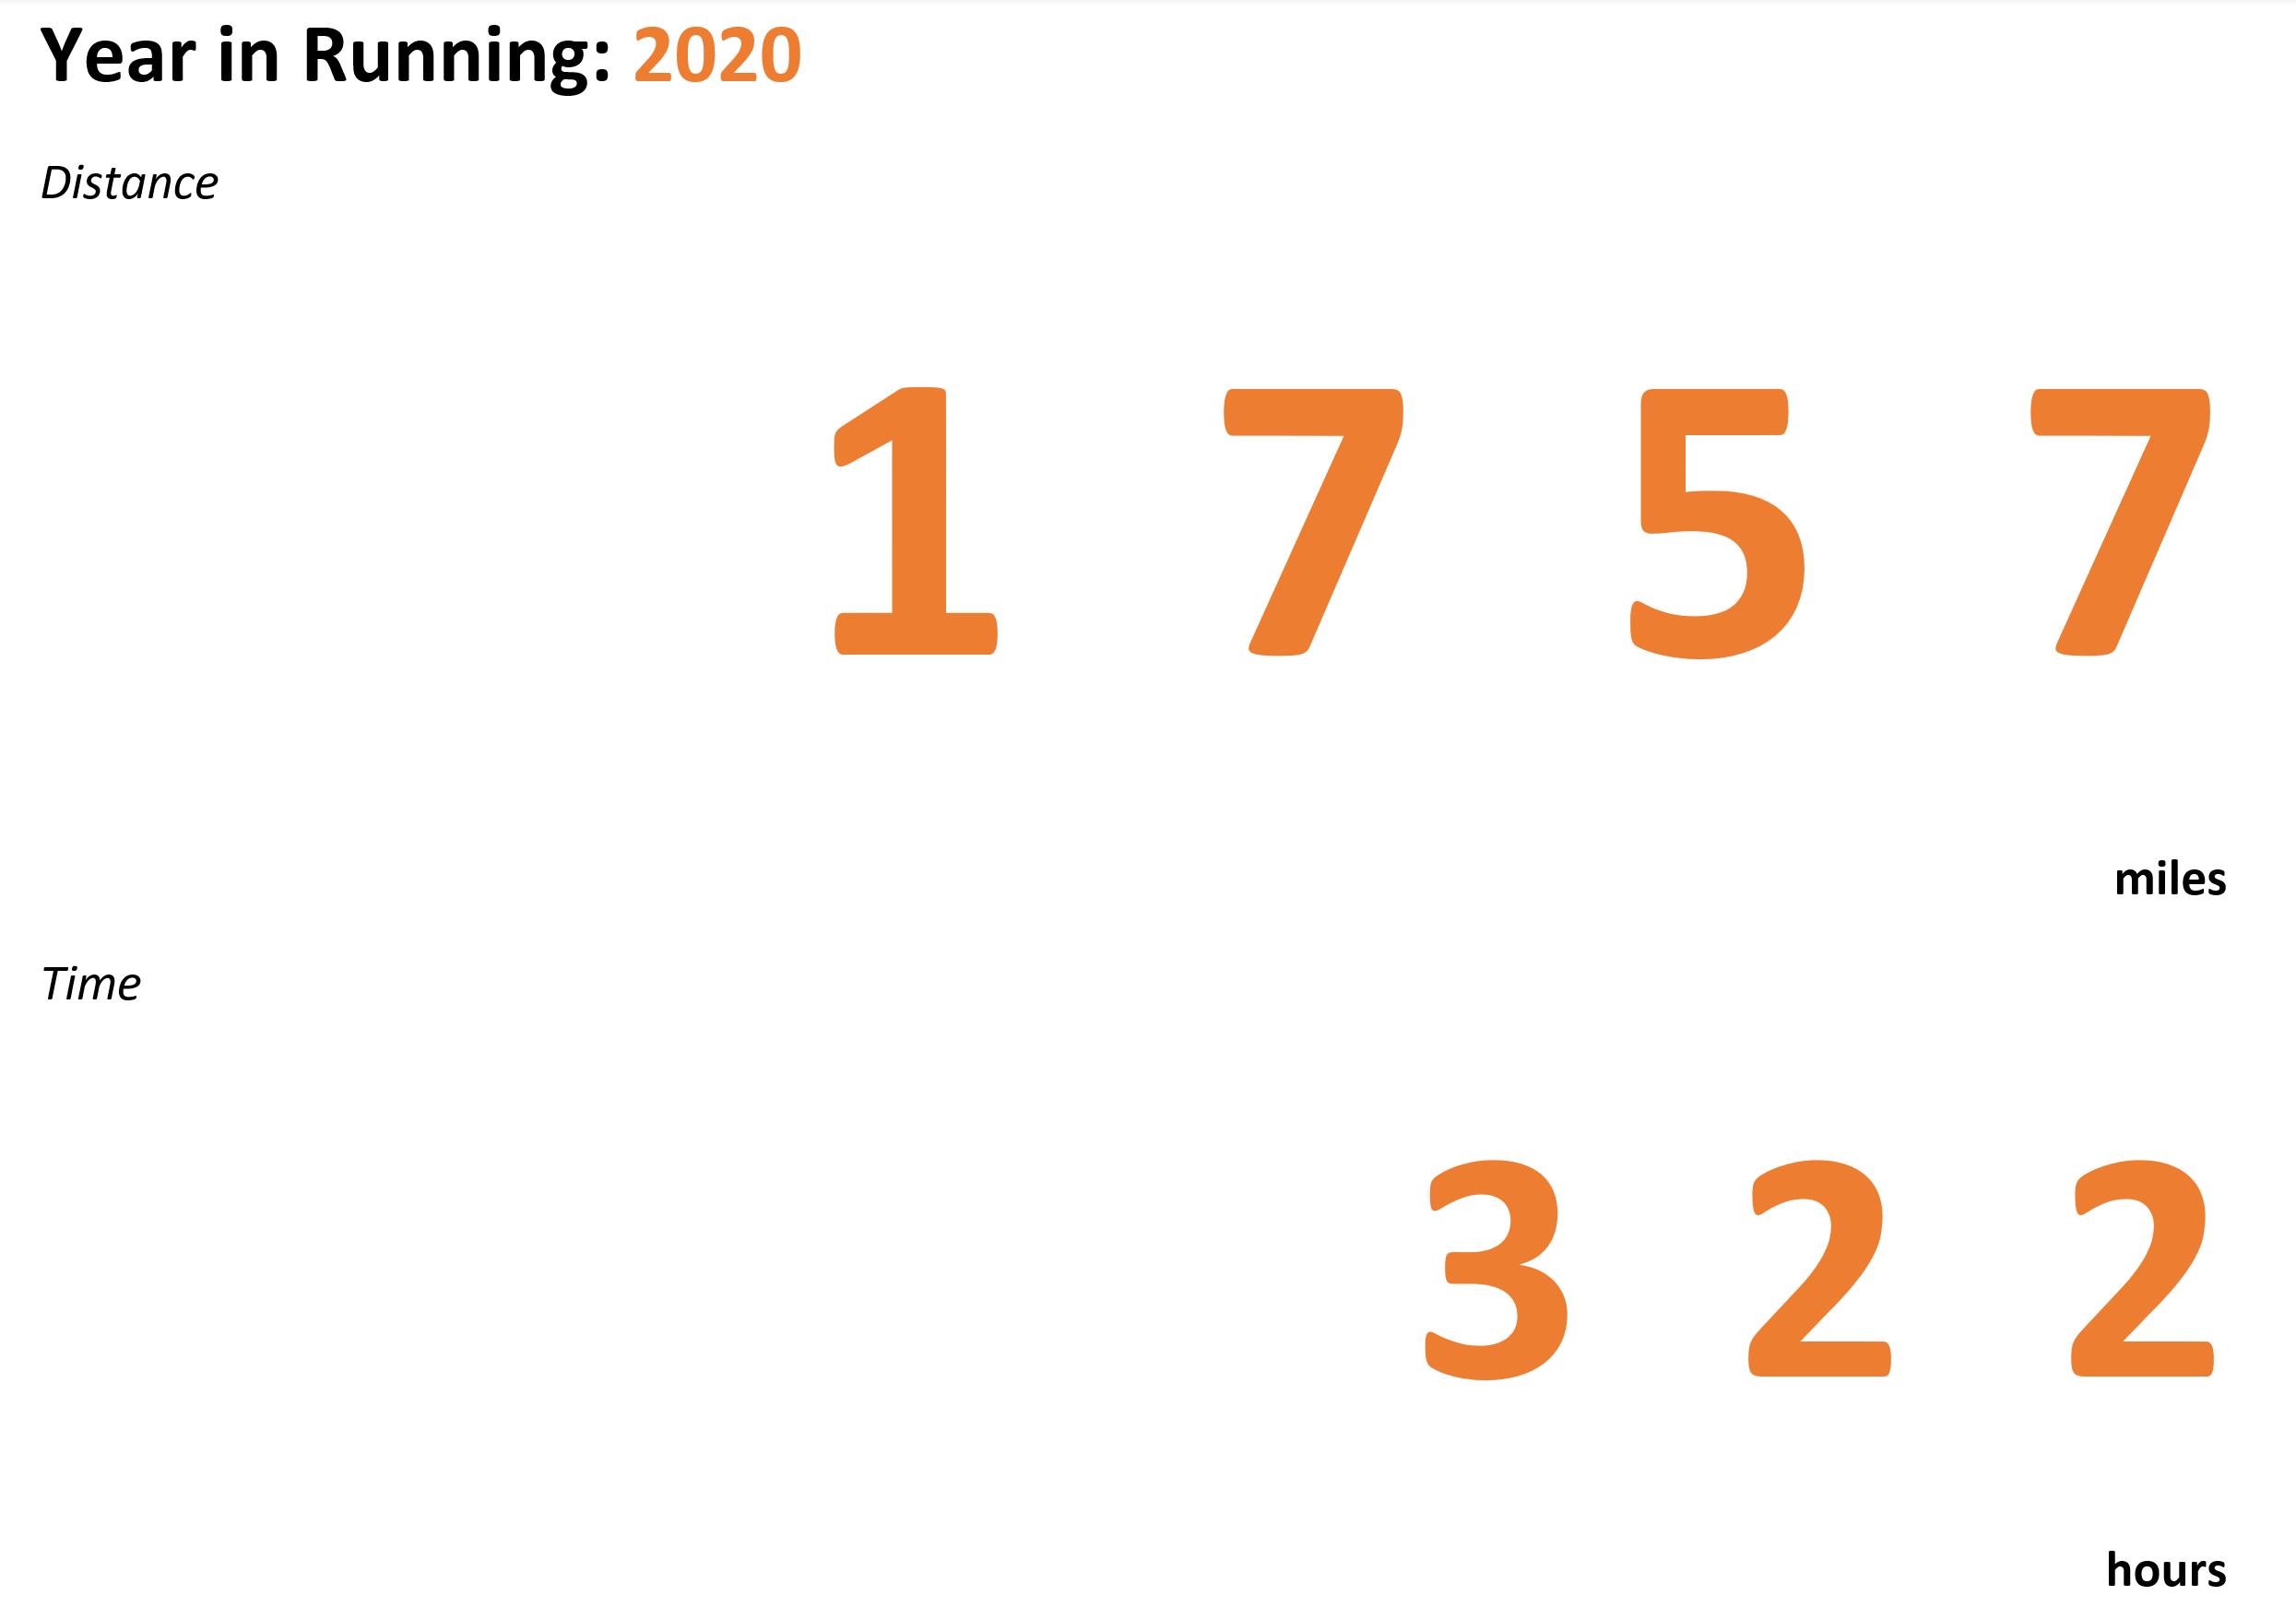 Year in Run: 2020